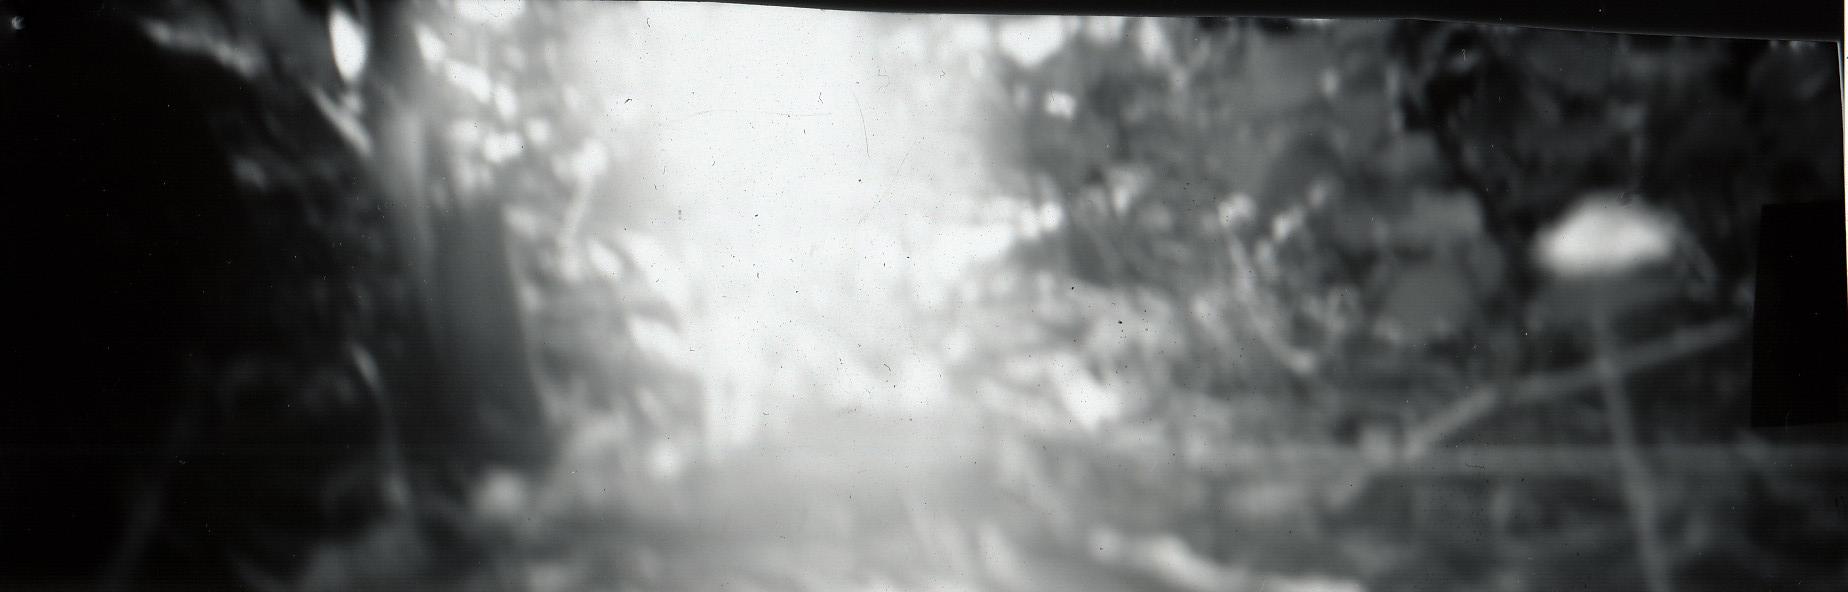 2018-09-17-bnewton-pinhole-pic6.jpg